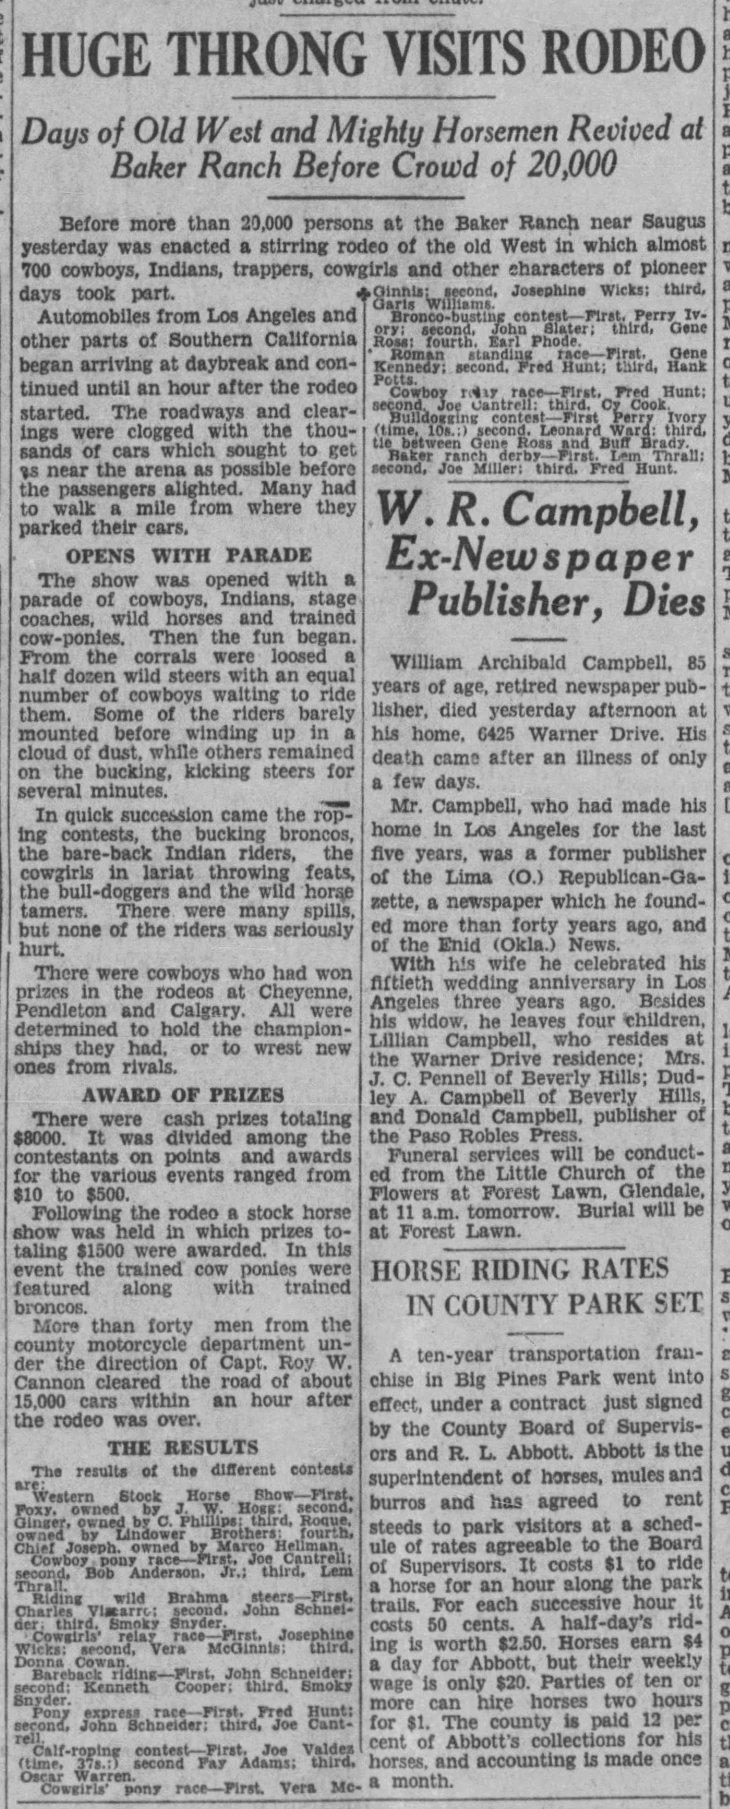 The_Los_Angeles_Times_Mon__Apr_29__1929_ (1)